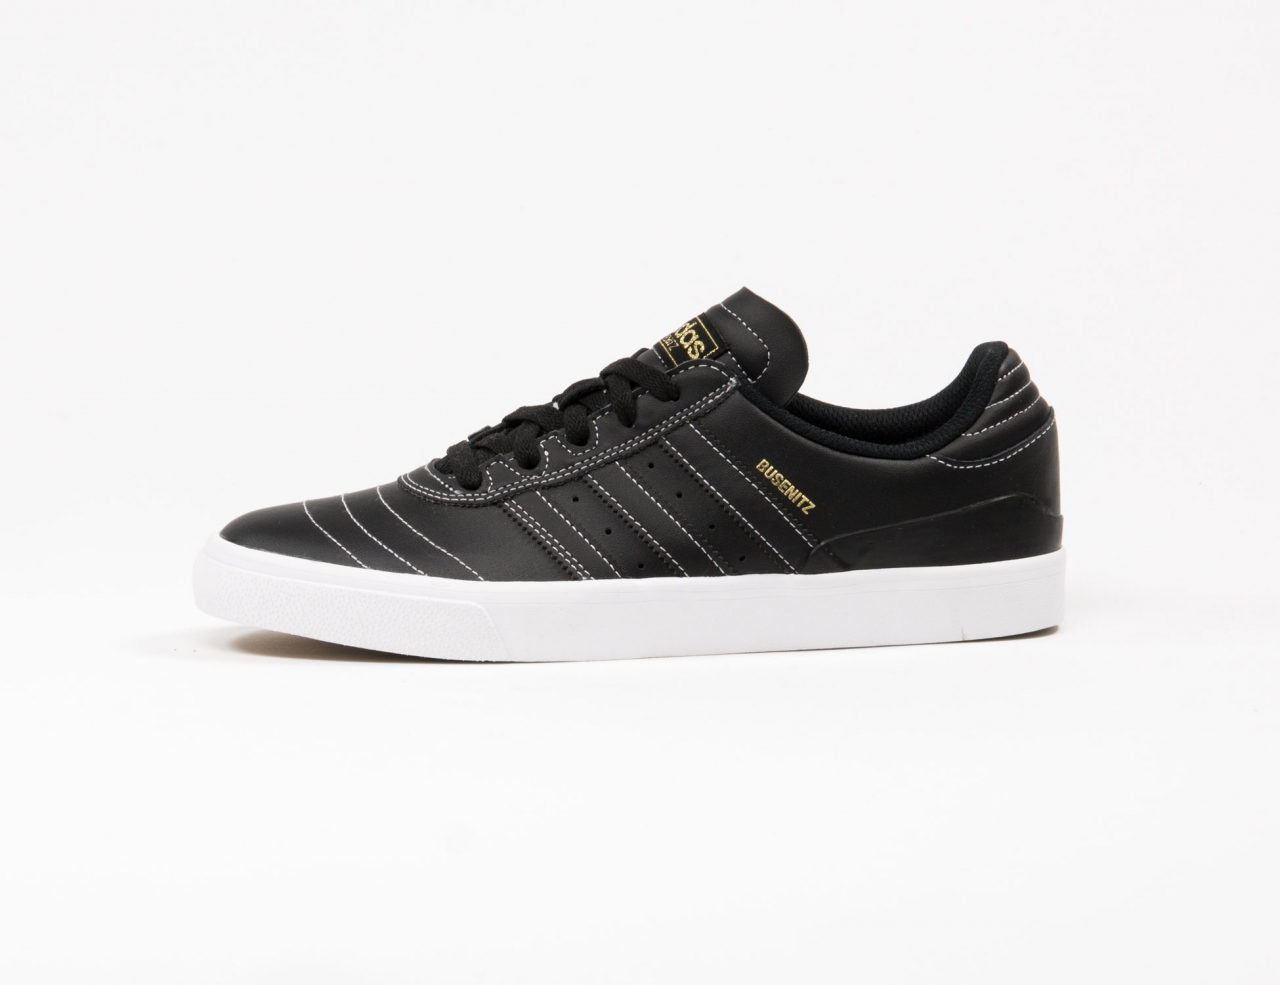 Adidas Adidas Busenitz Vulc Schuh